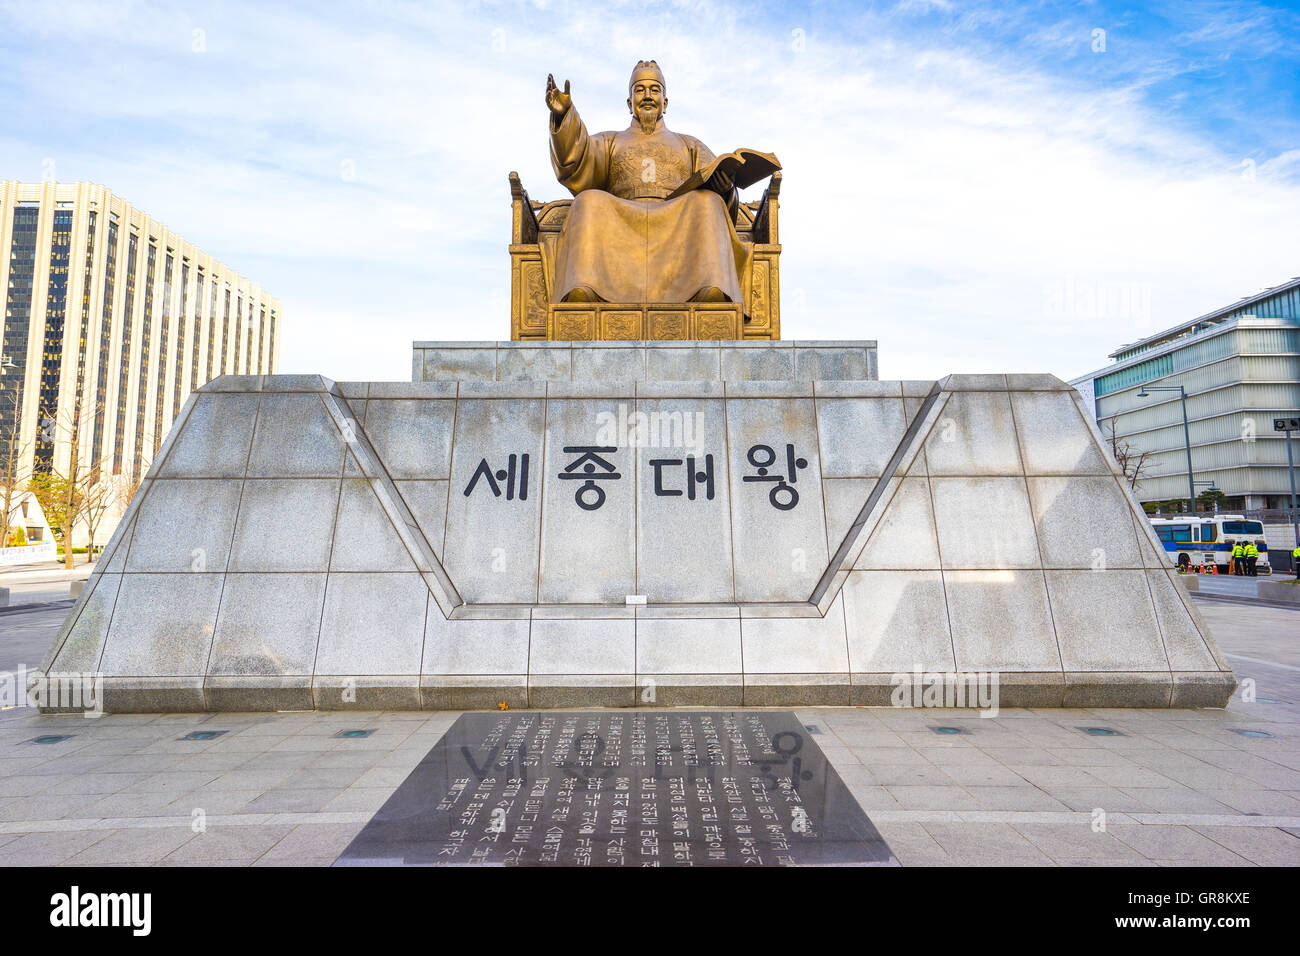 Statue of Sejong the Great King at Gwanghwamun Plaza in Seoul, South Korea. - Stock Image